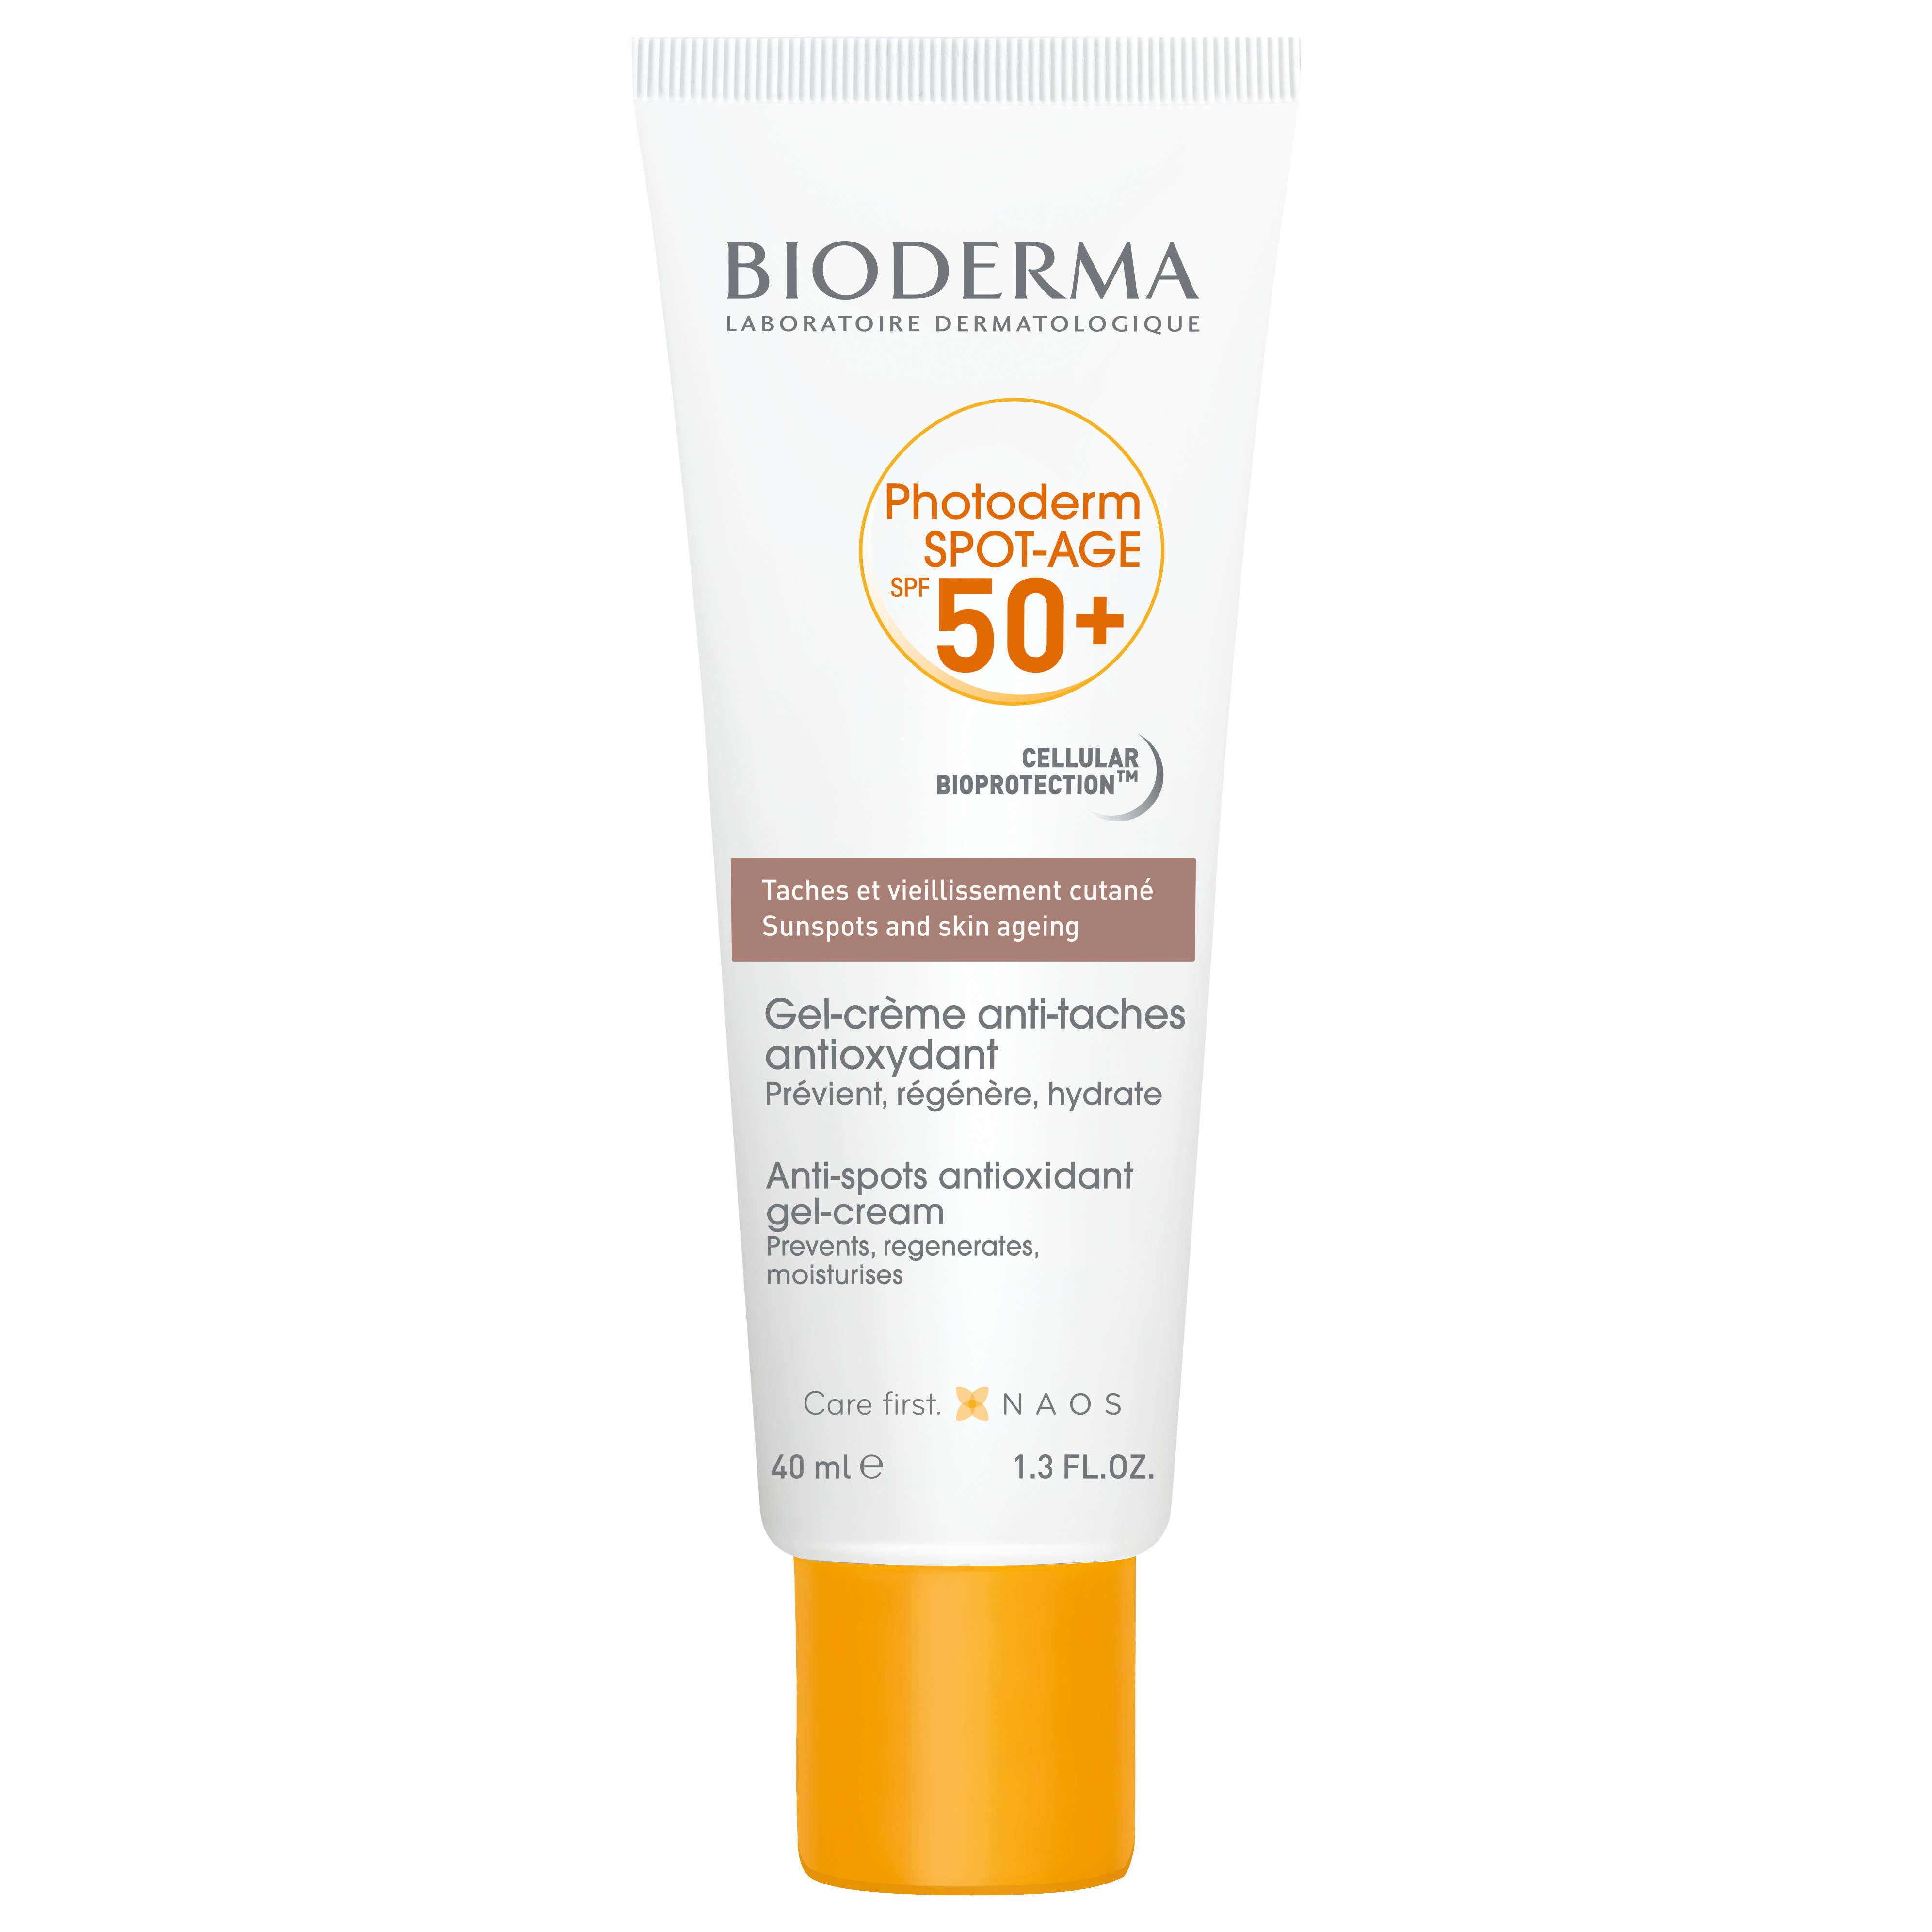 Bioderma - Spot-age - Crema specifica per macchie - SPF50+